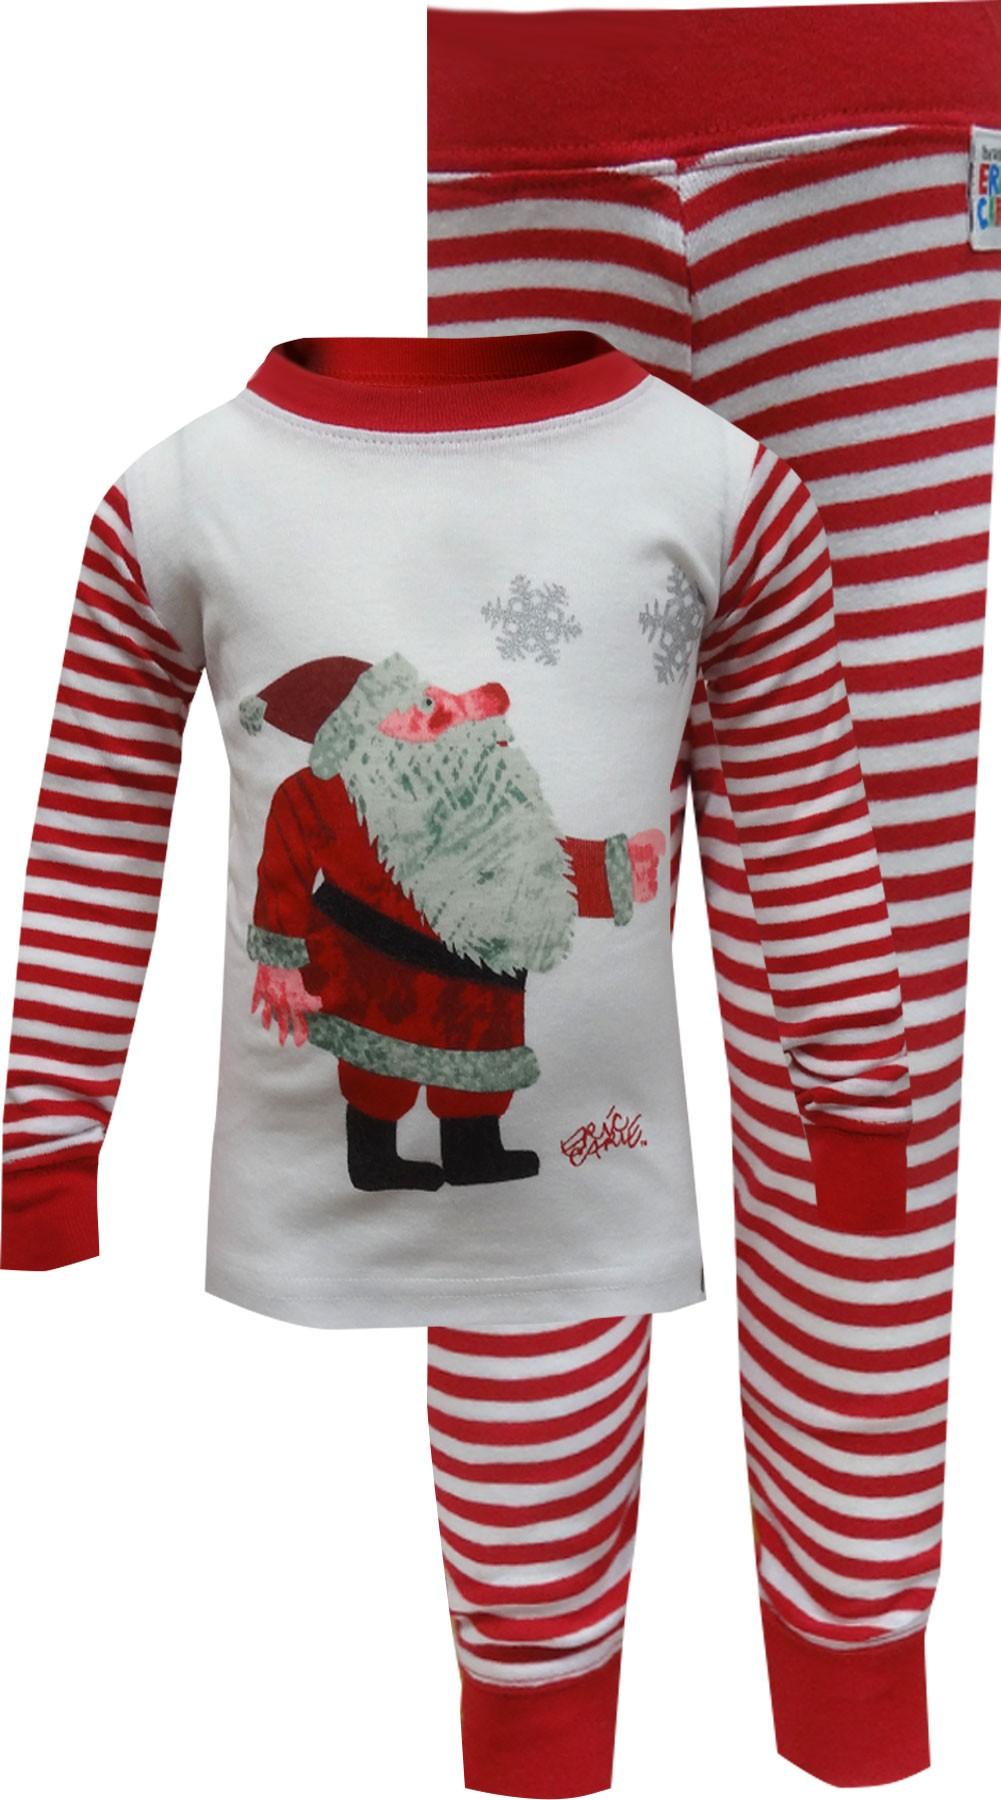 Image of Eric Carle Santa Infant Christmas Pajama for boys